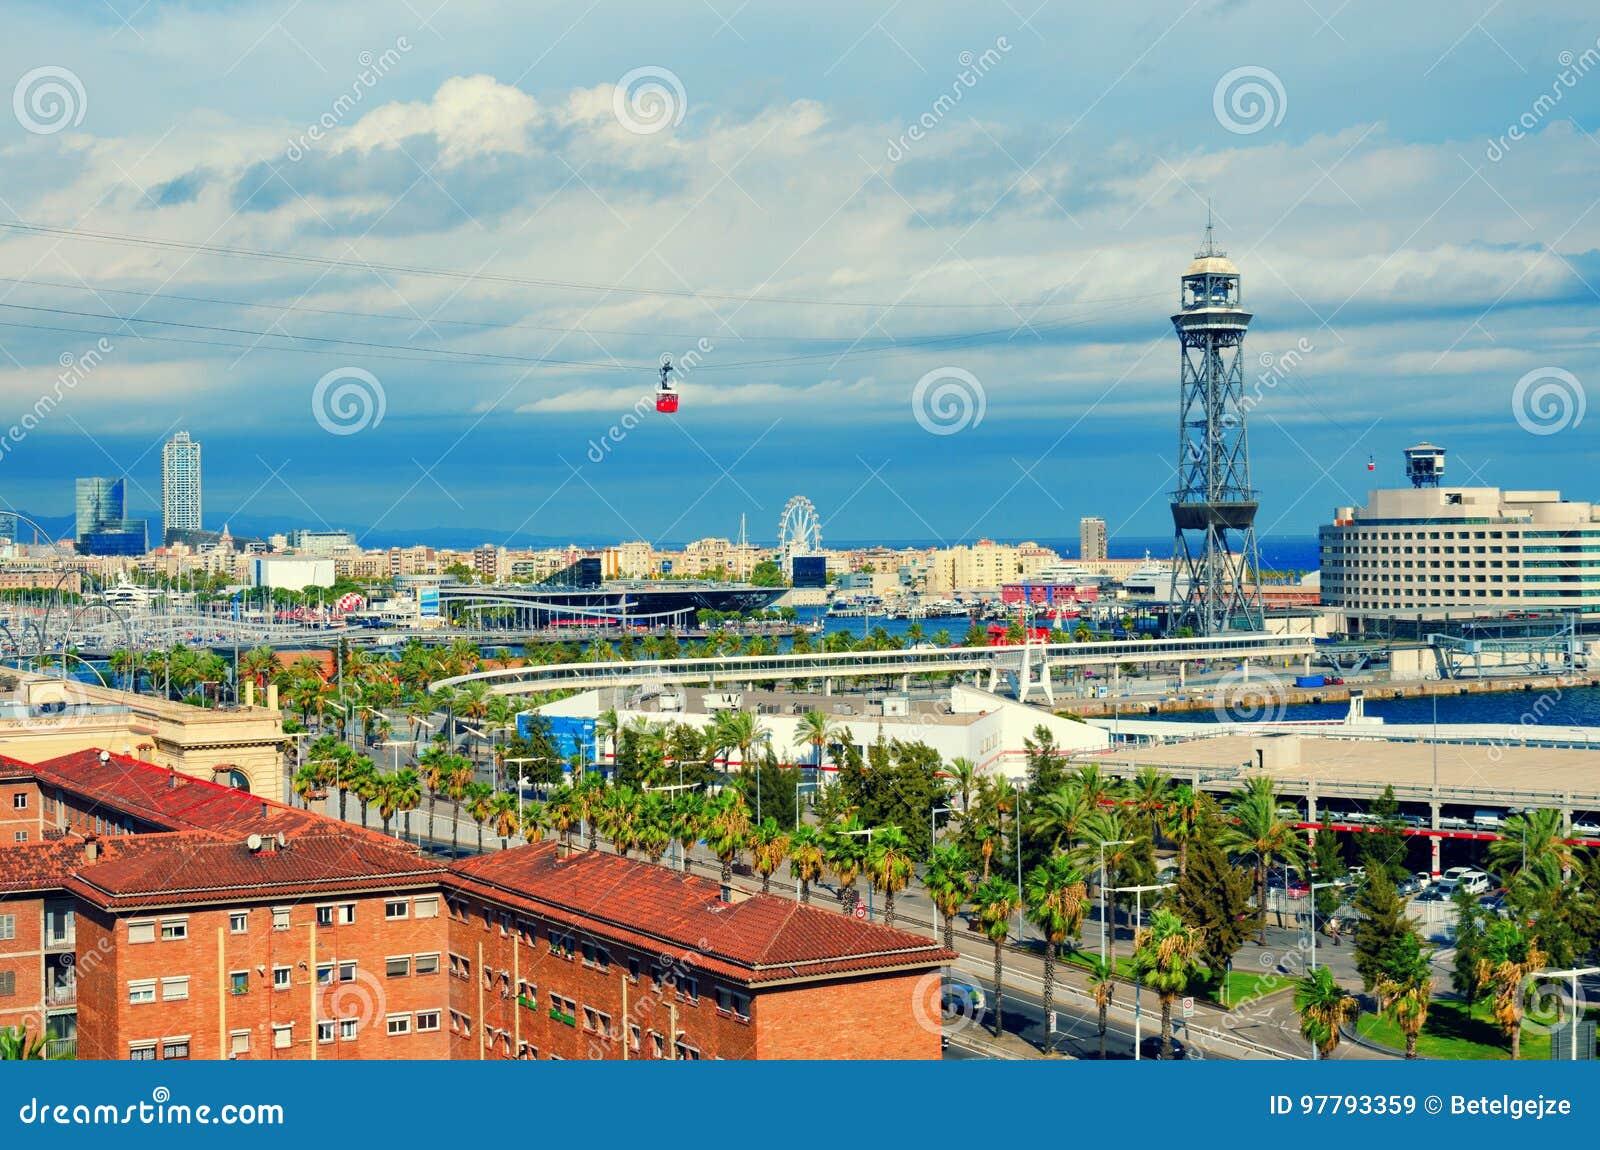 Vista aérea de Barcelona La Barceloneta, puerto Vell, mar y cabina roja del cablecarril Cataluña, España